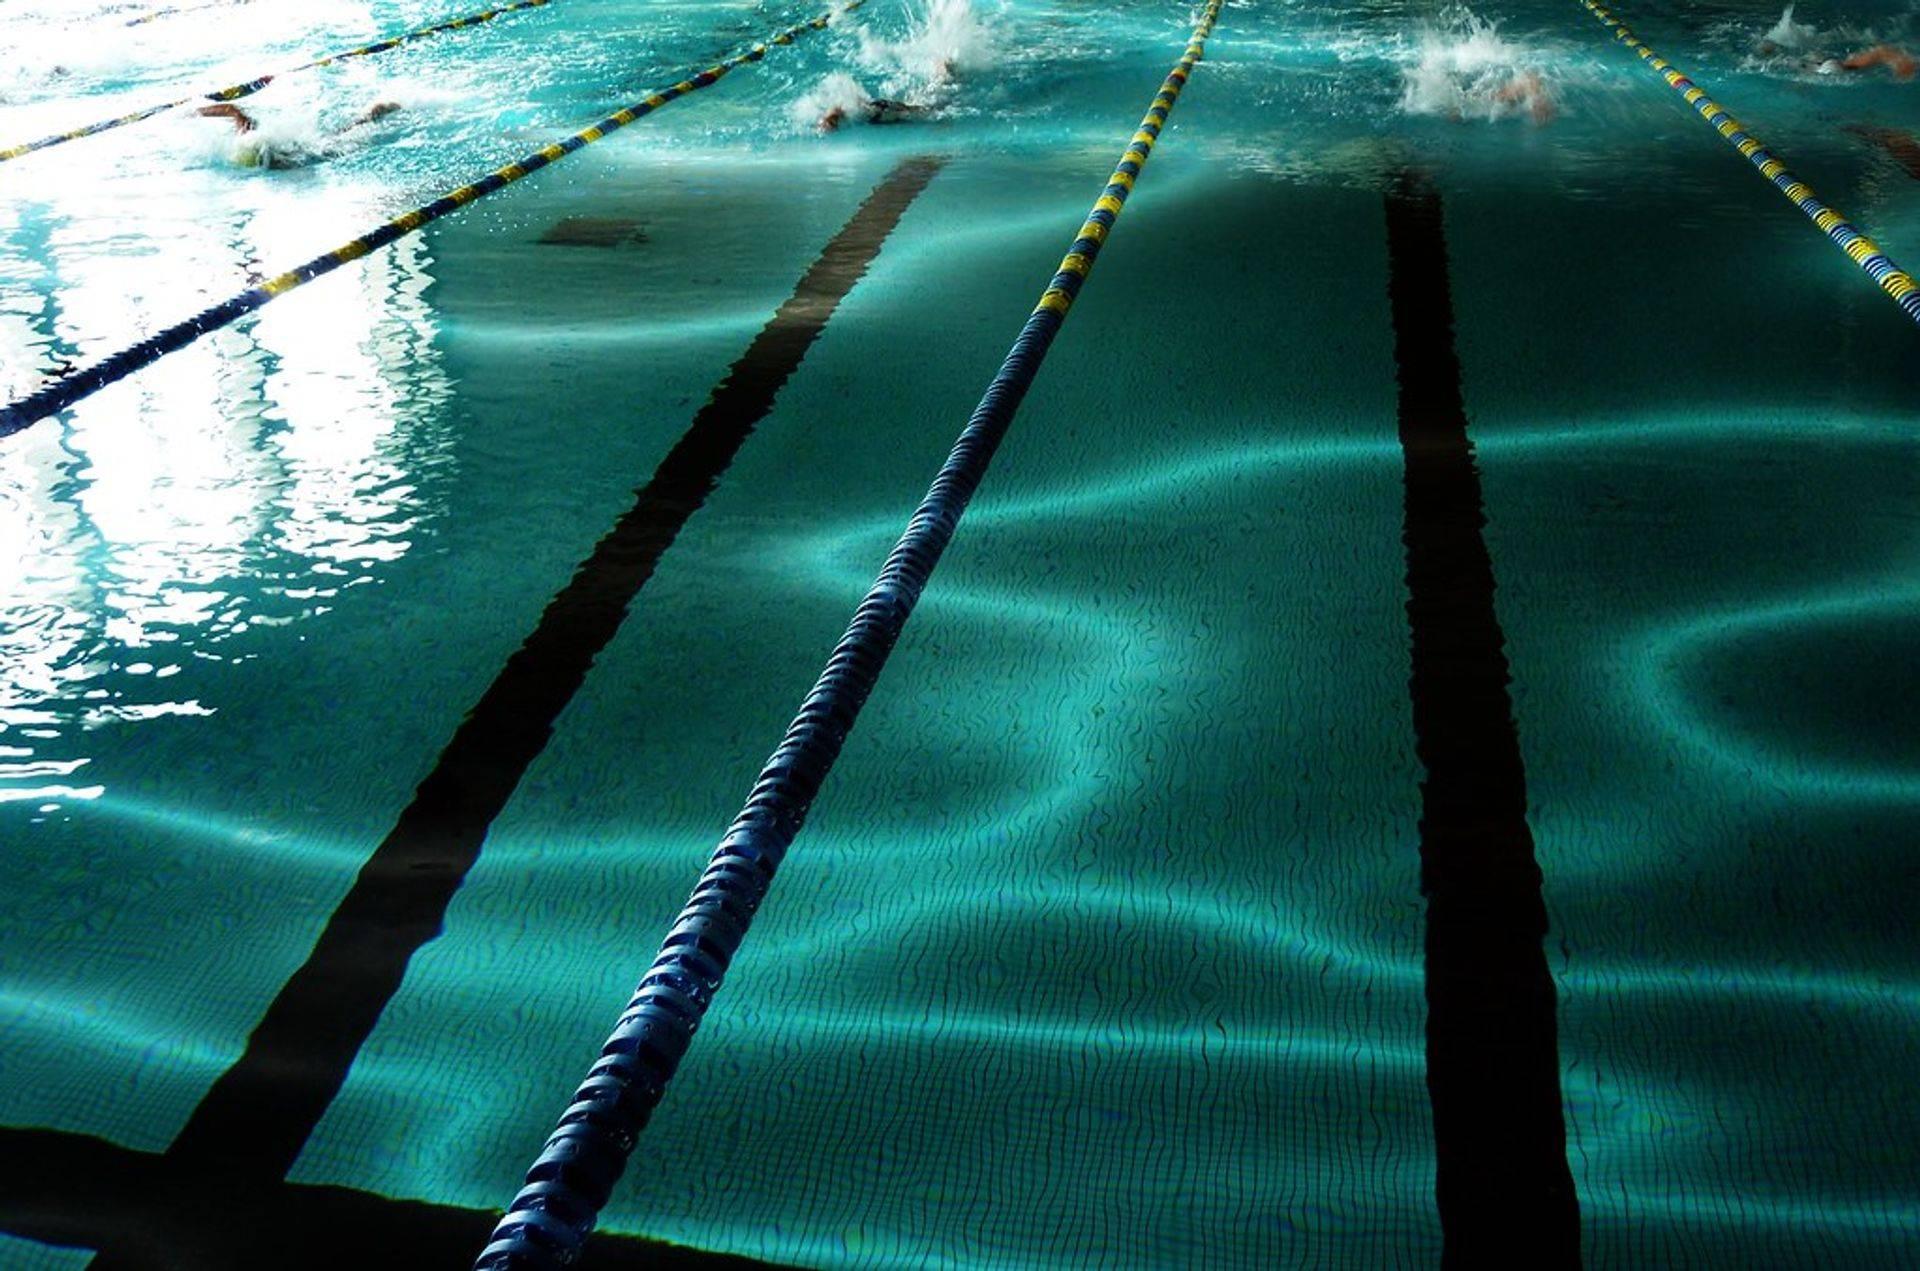 couloir de piscine